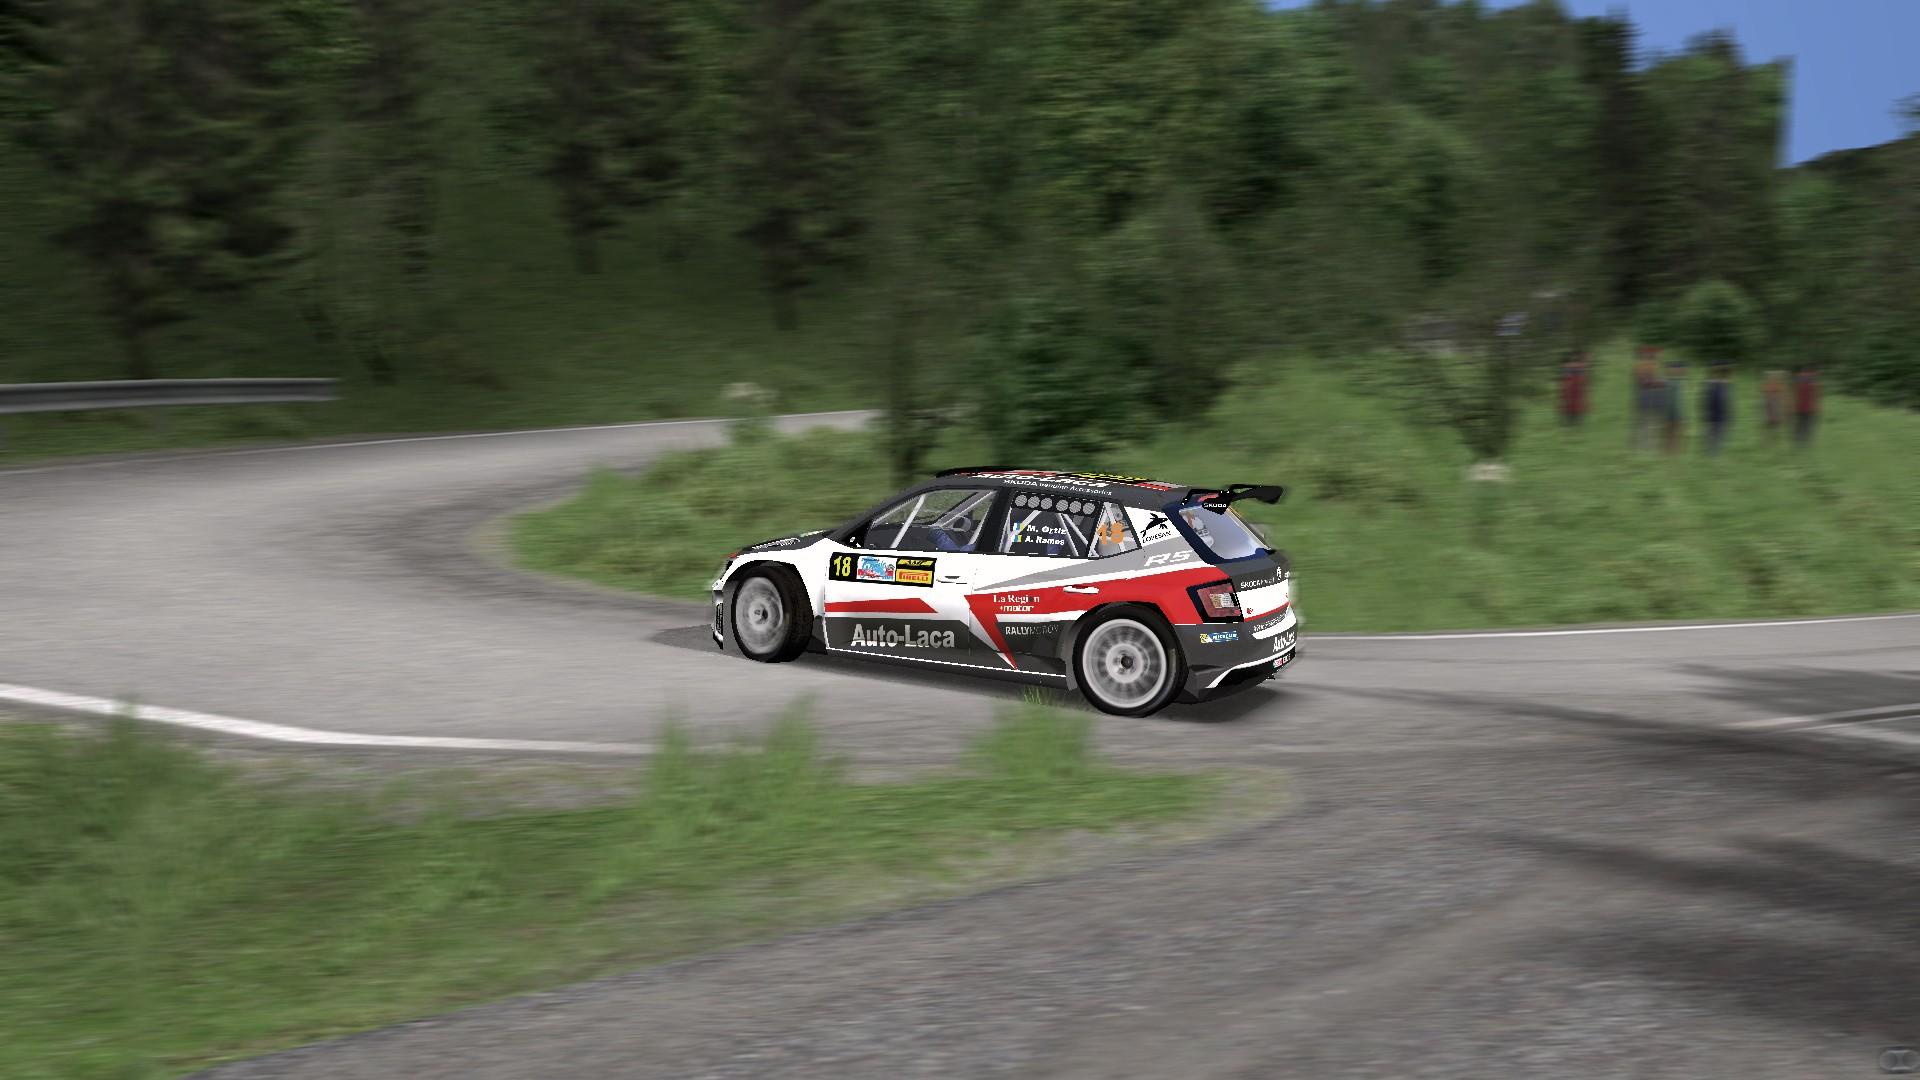 2. CGRV - Rallye De Noia - Página 2 SiFv5N